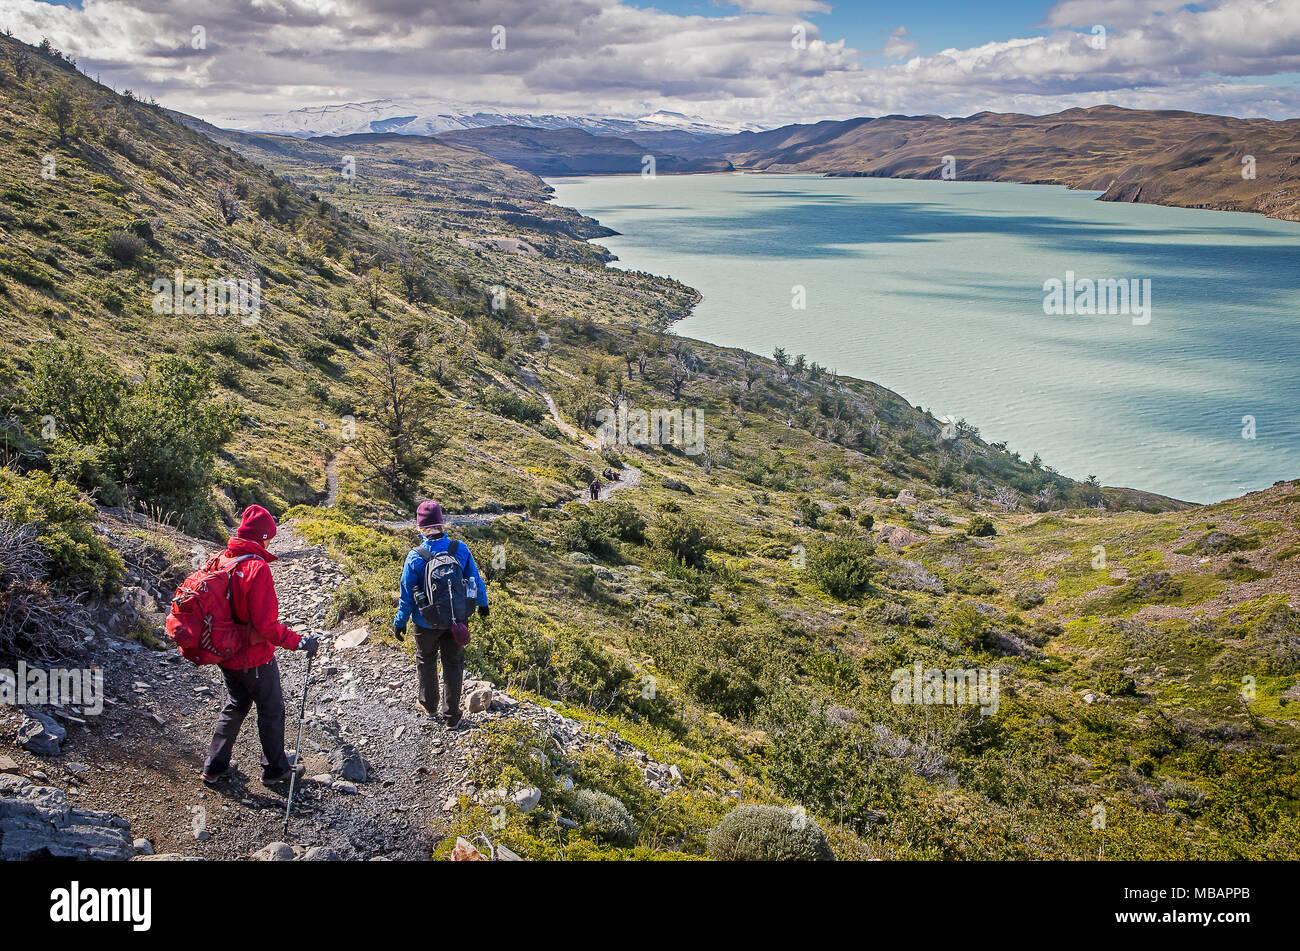 Hikers walking, in background Lago Nordenskjöld, Torres del Paine national park, Patagonia, Chile - Stock Image